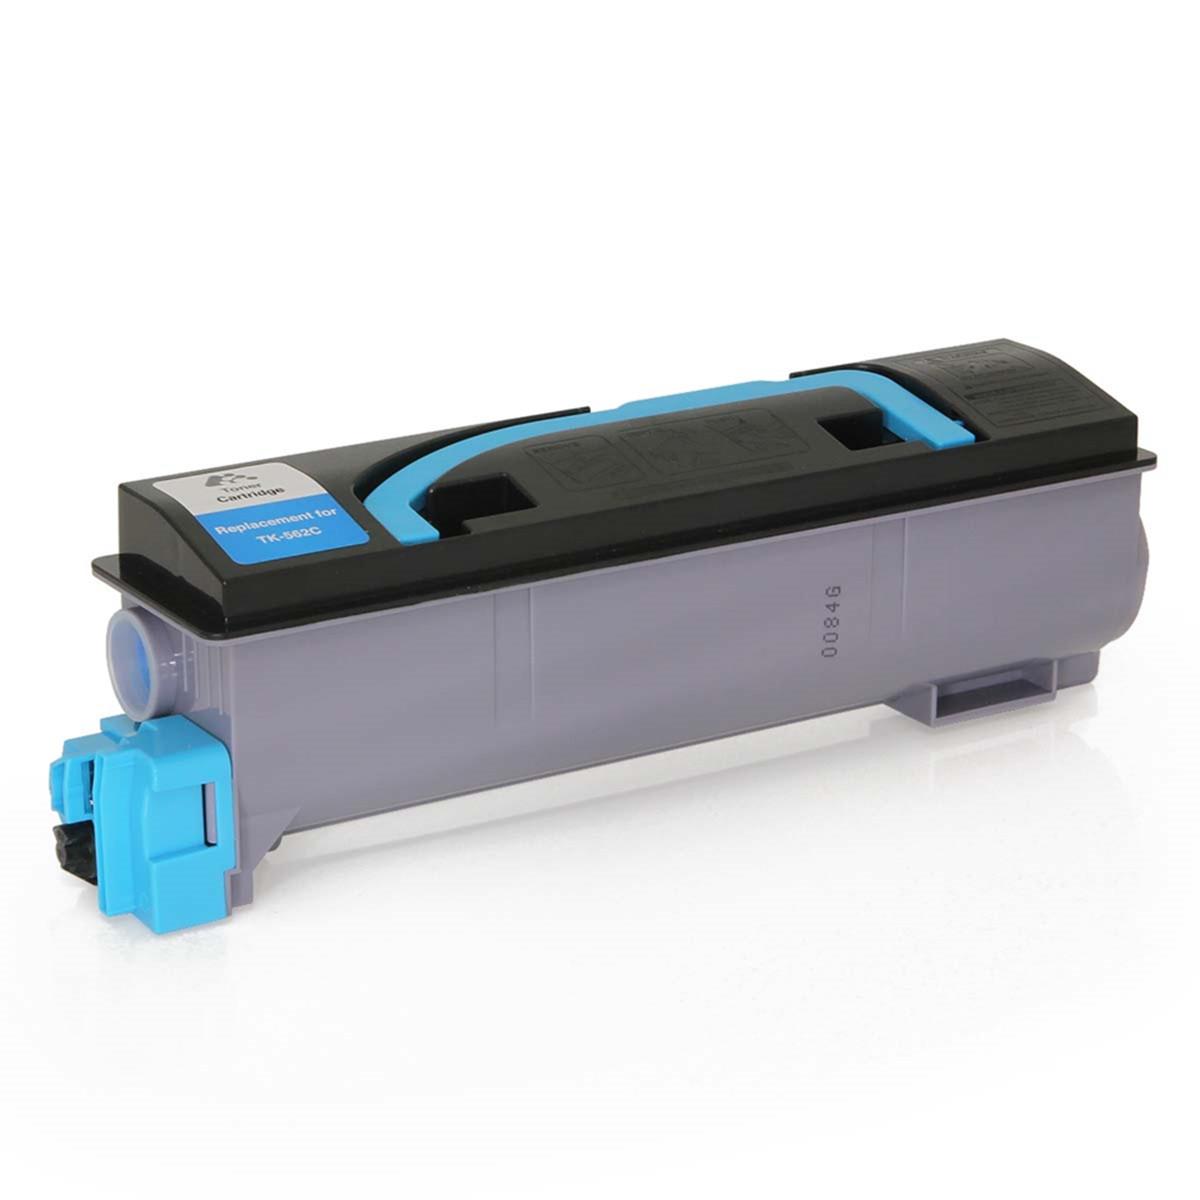 Toner Kyocera TK-562C Ciano | FS C5300 FS C5300DN FS C5350 FS C5350DN | Katun Performance 10k